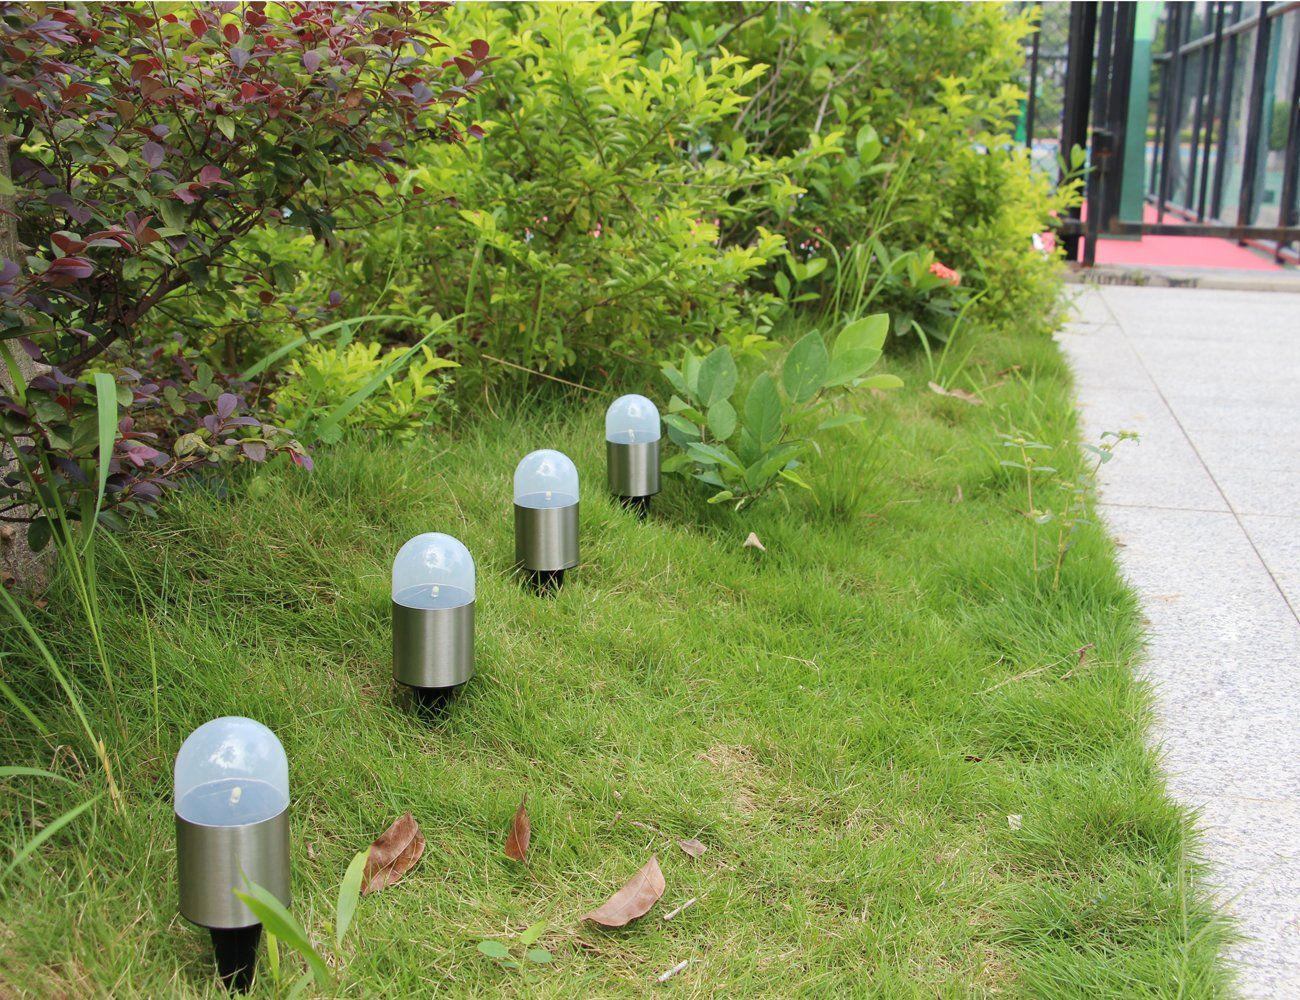 AmazonOnly 11.49 on UEasy 4 Pack Solar Garden Light